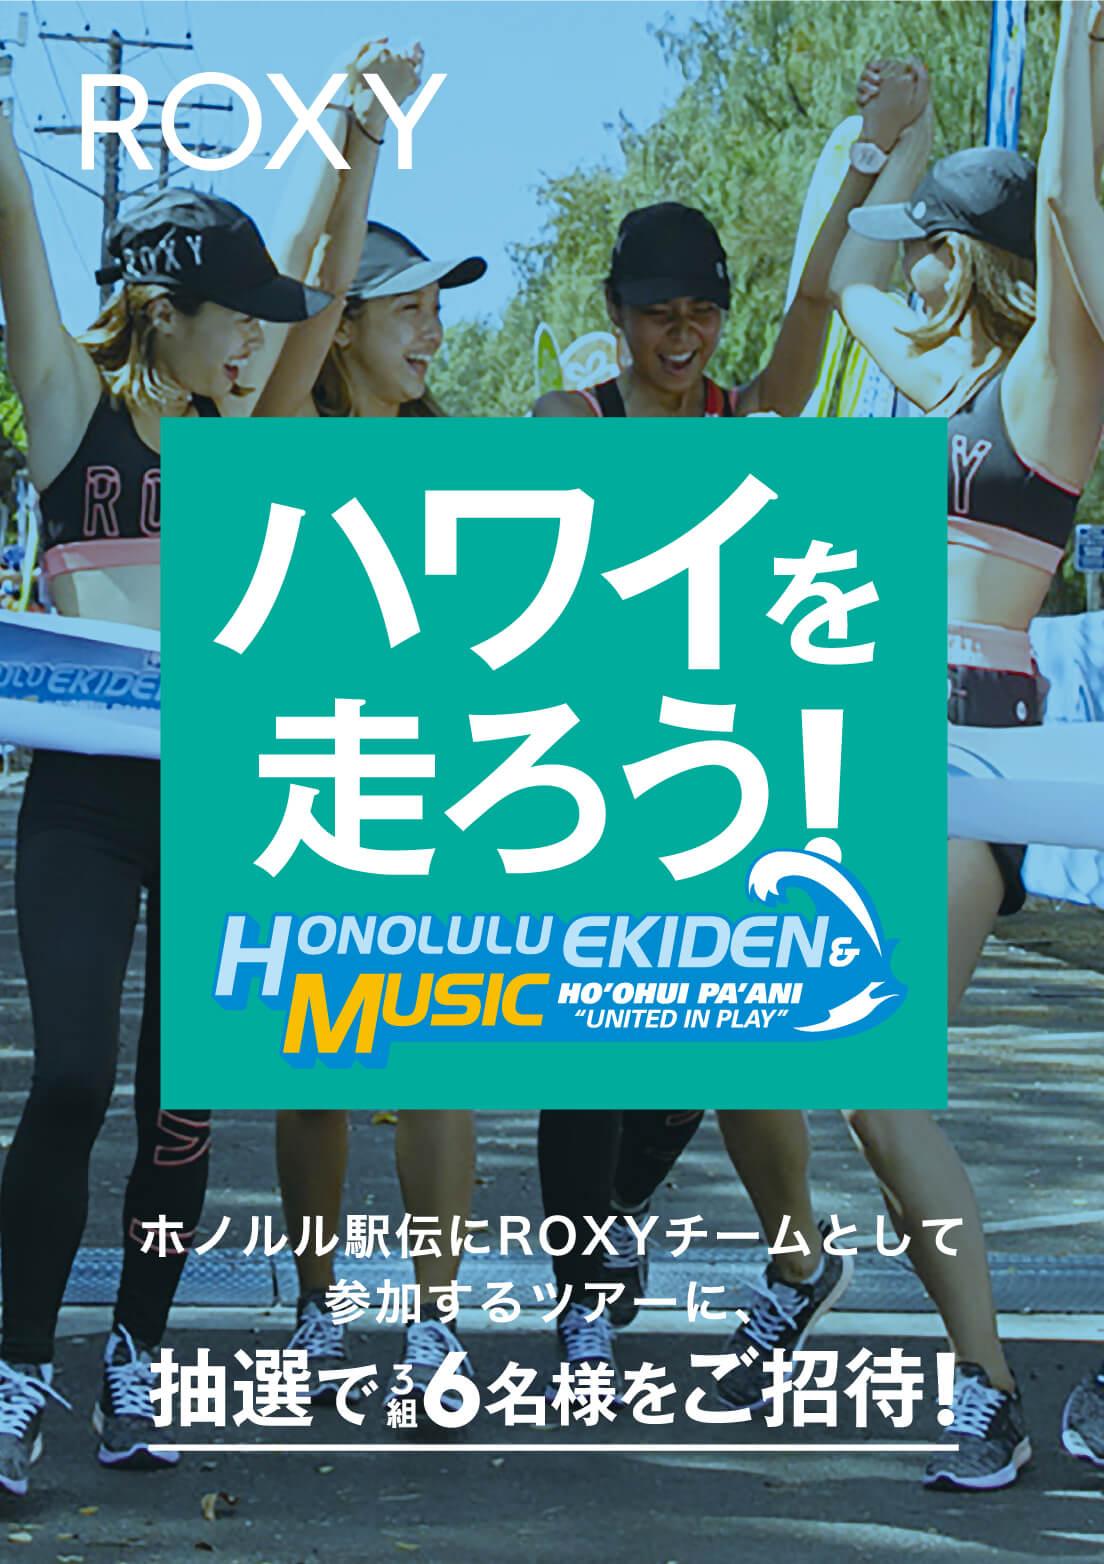 ROXY ハワイを走ろう! HONOLULU EKIDEN & MUSIC HO'OHUI PA'ANI UNITED IN PLAY